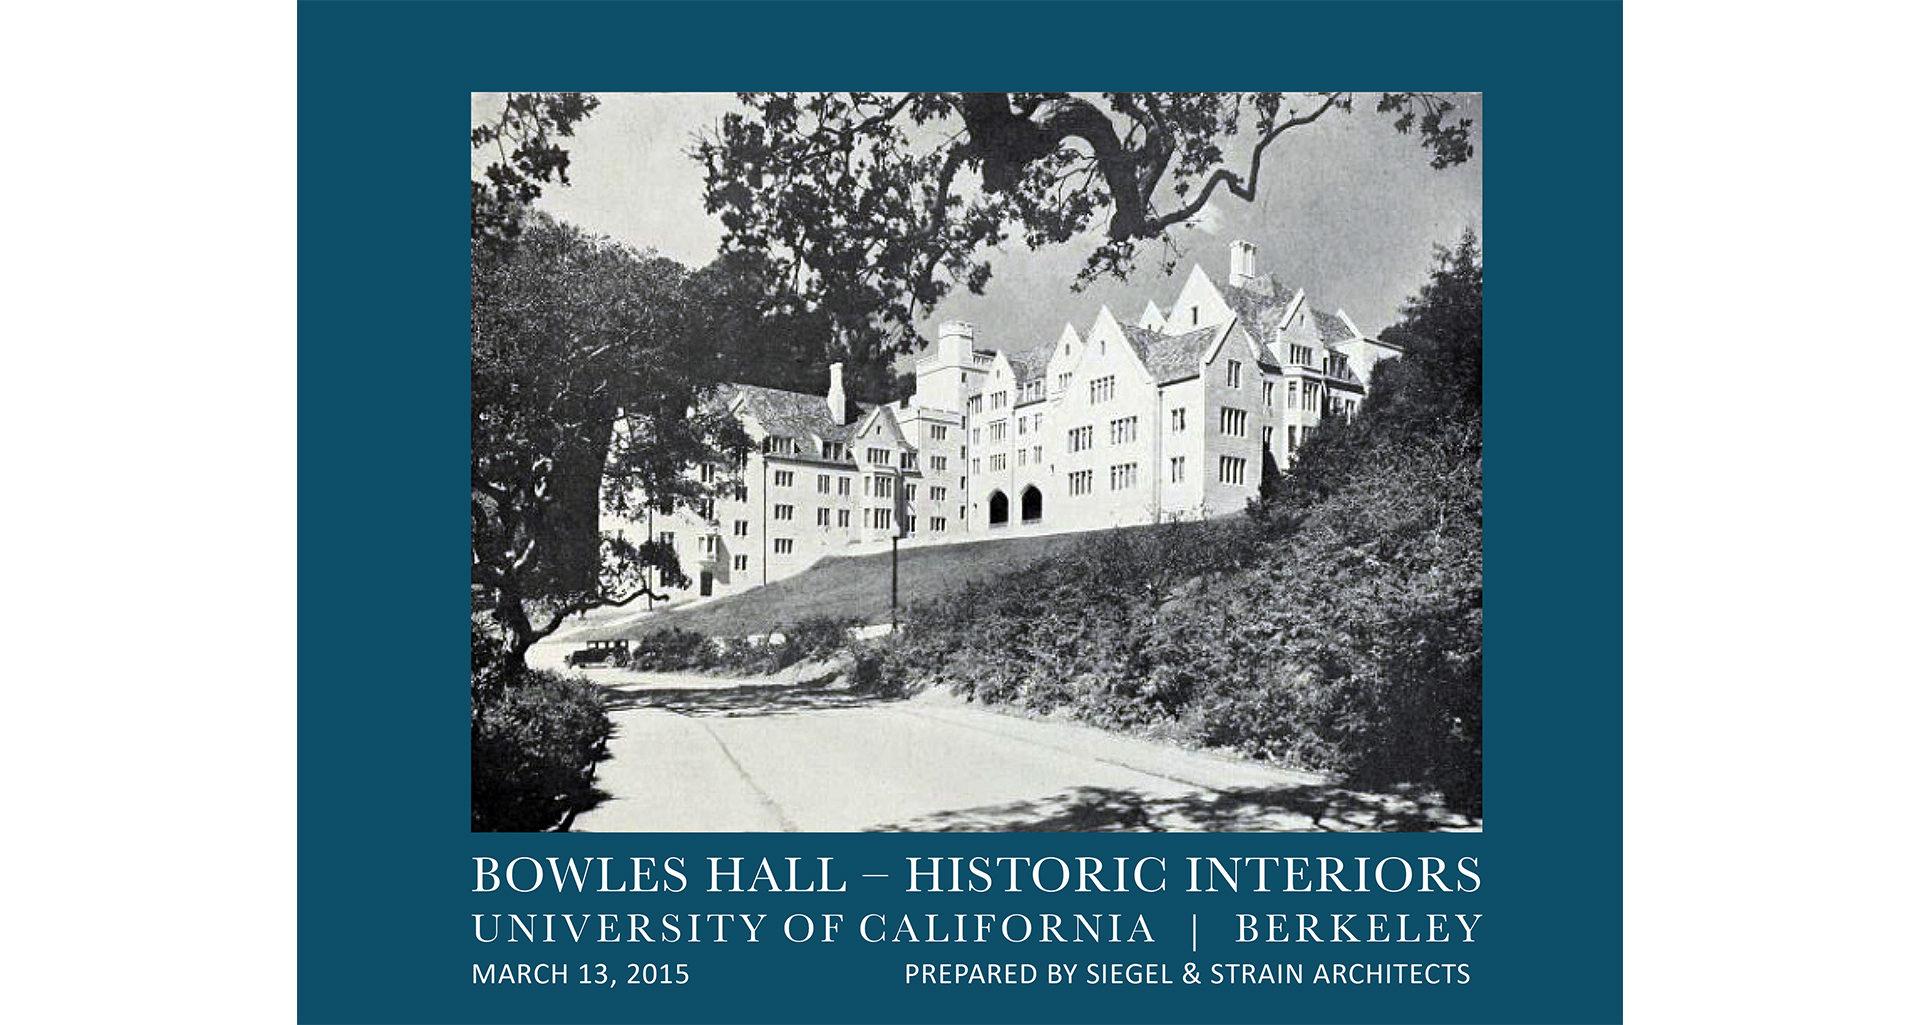 UC Berkeley Bowles Hall | Historic Interiors Report